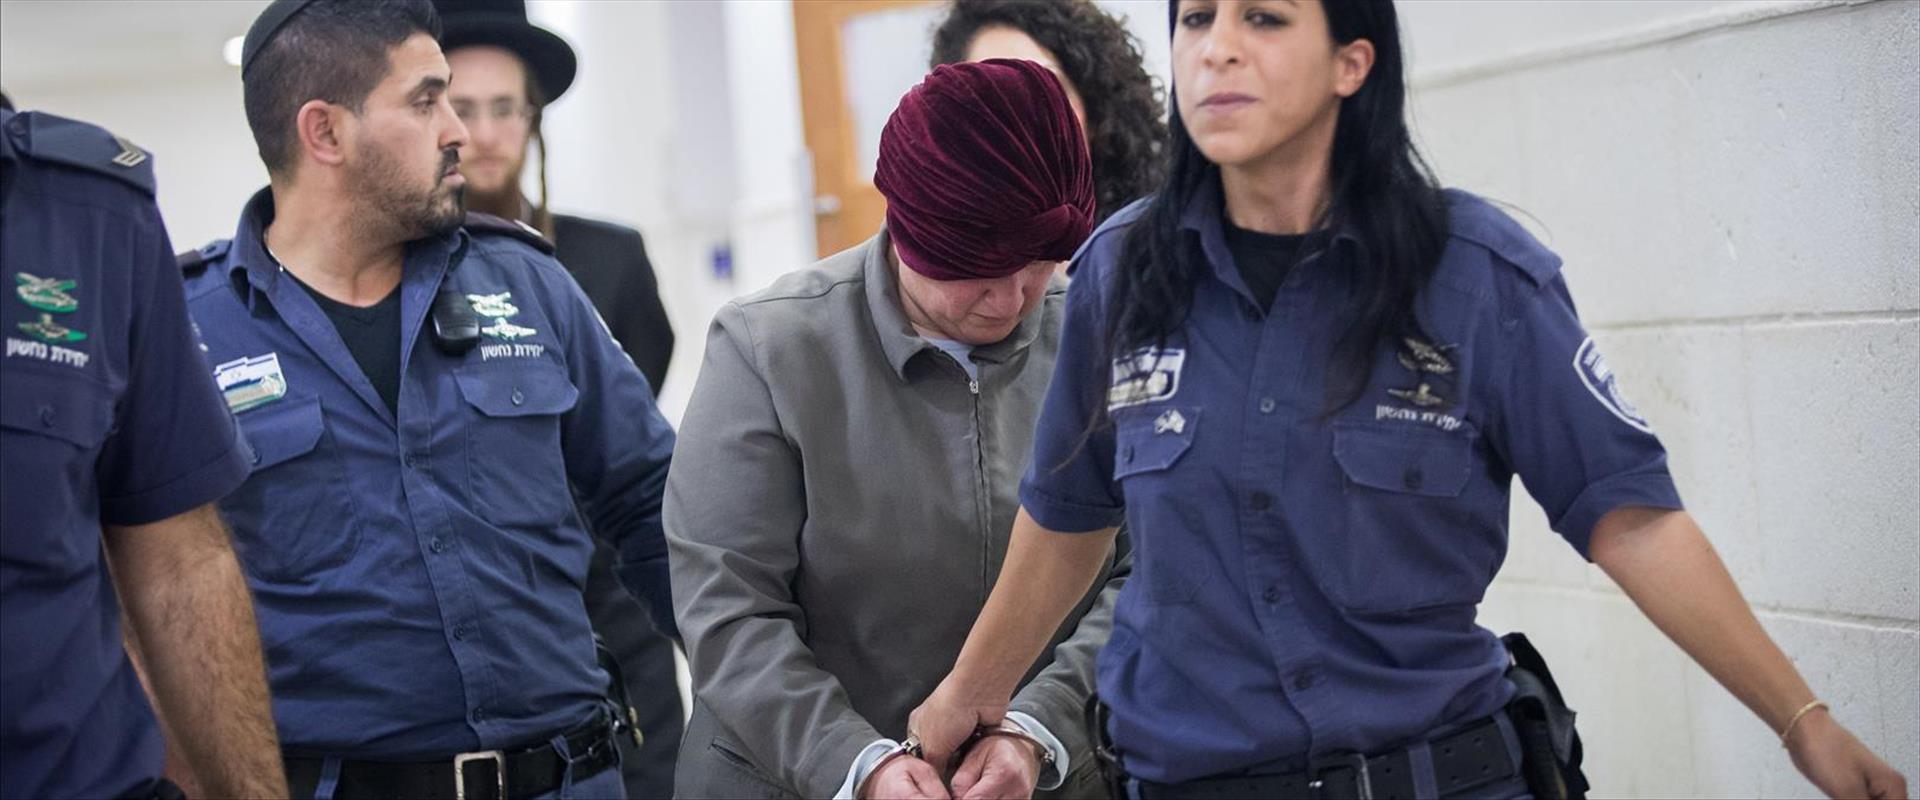 Malka Leifer extradée aujourd'hui d'Israël vers l'Australie